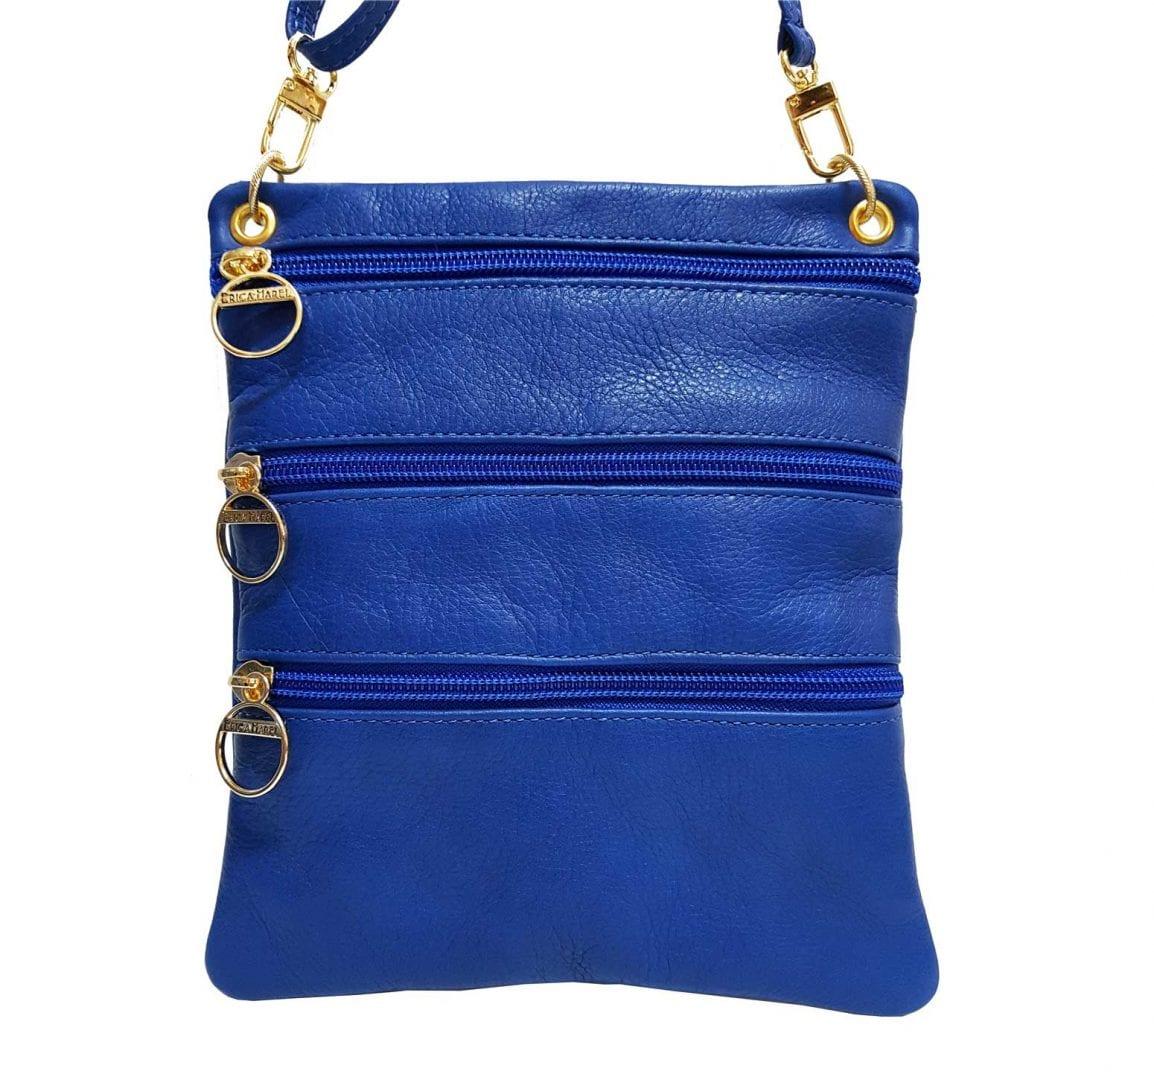 blue leather sidekick mini bag